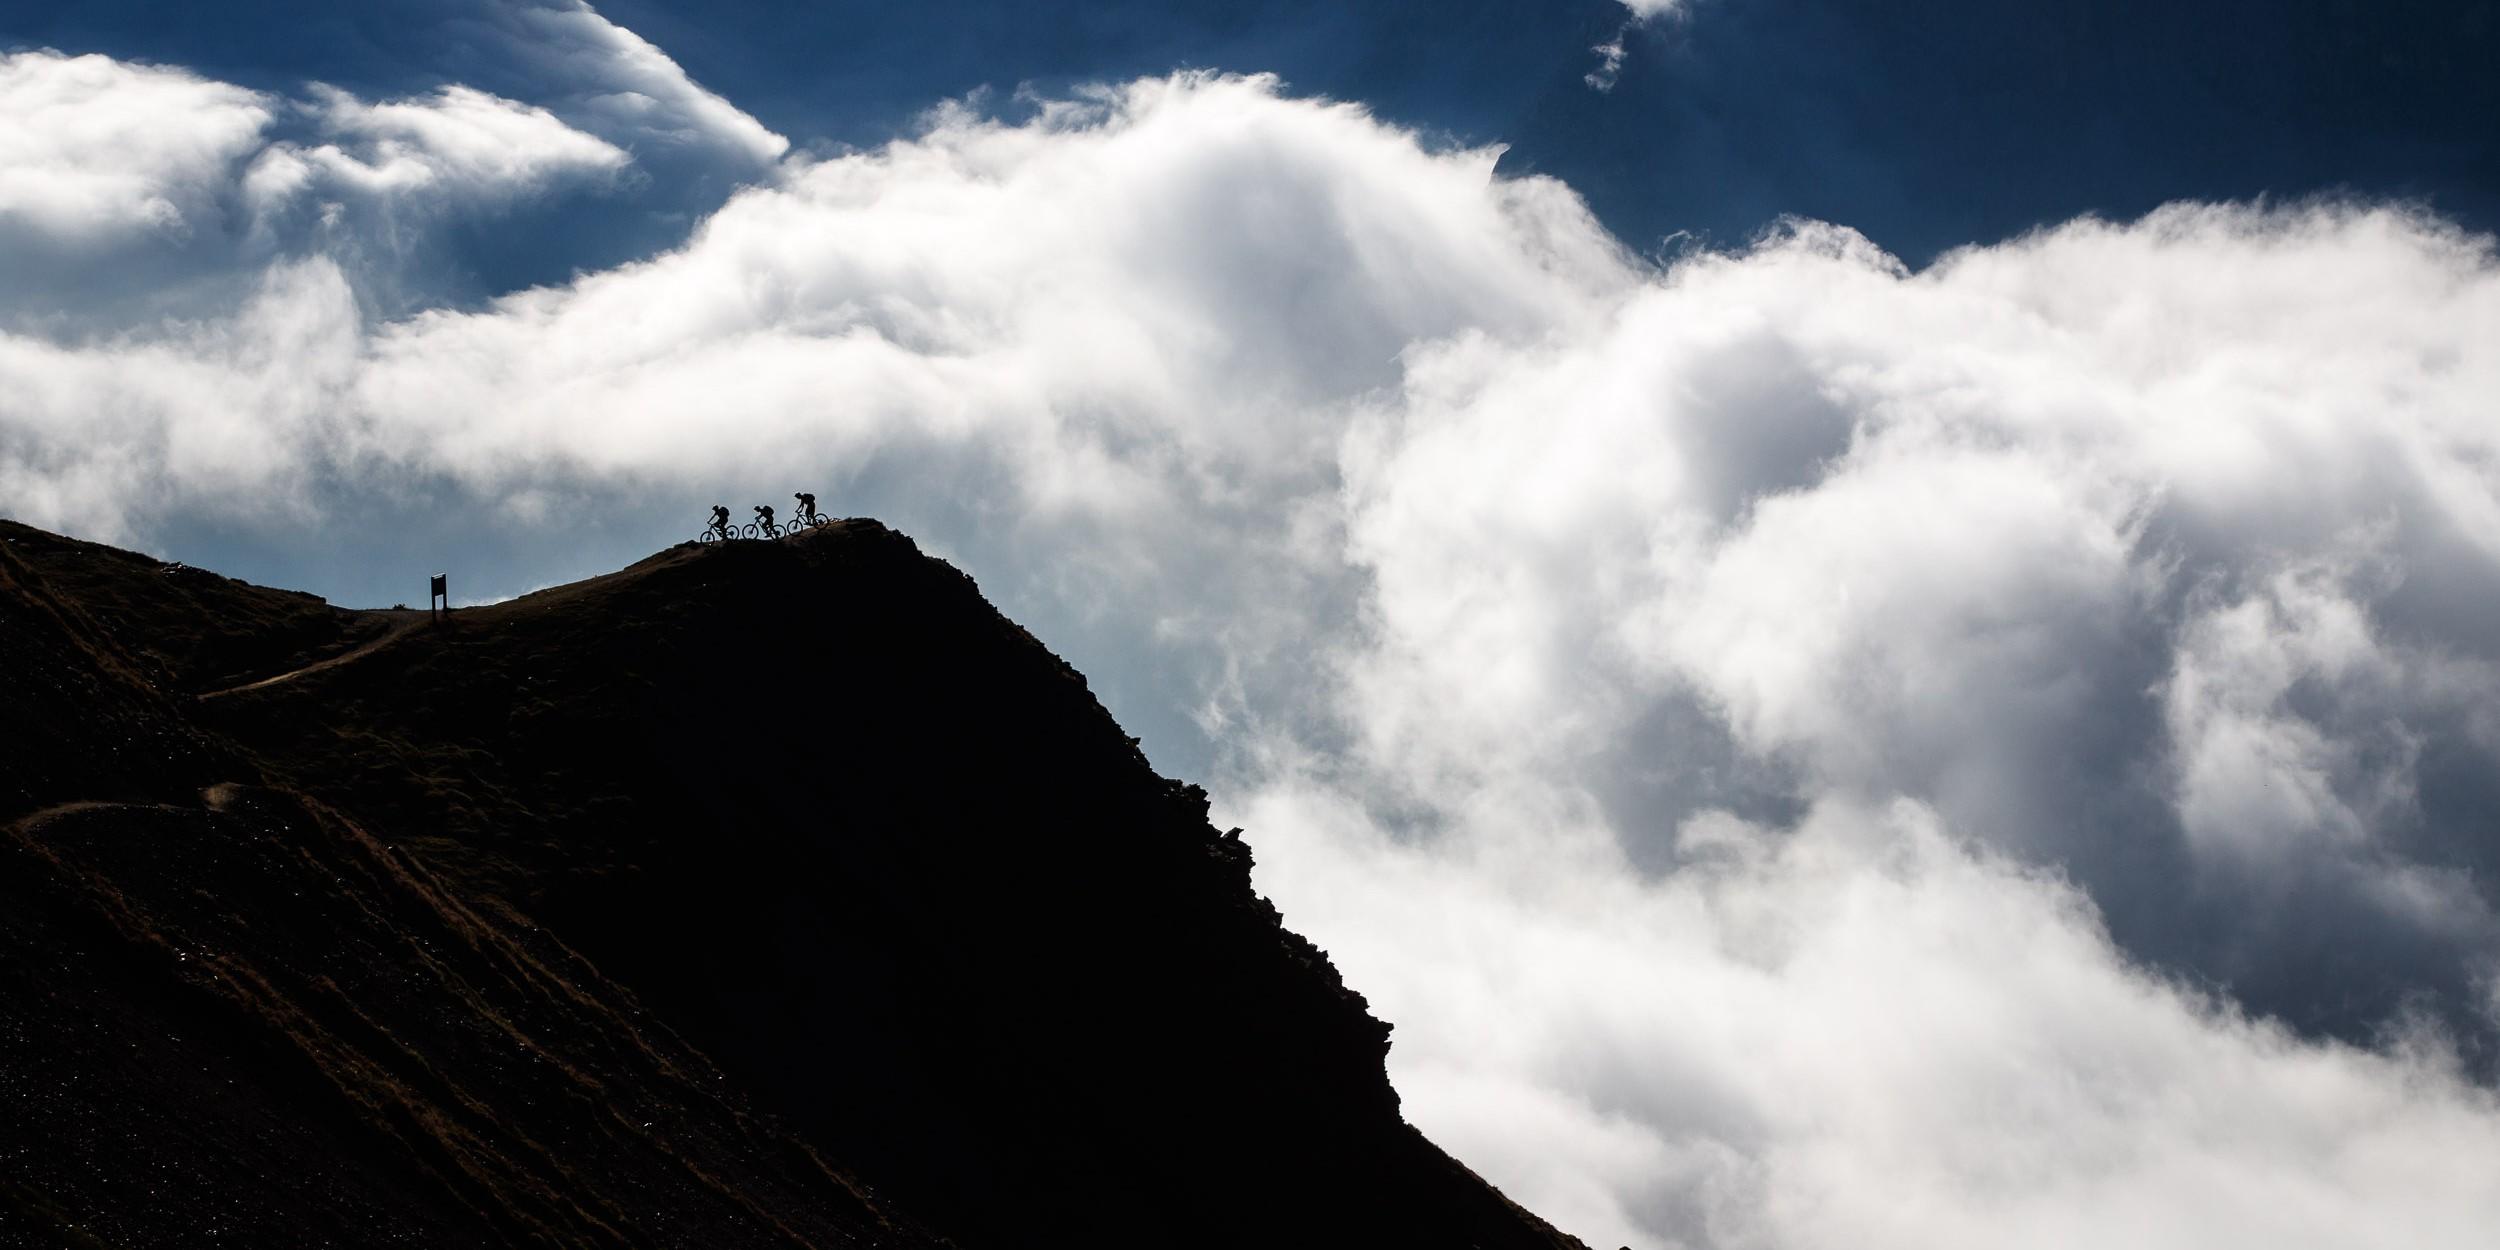 Komplizentour - Bike mountaineering in South Tyrol & Co.